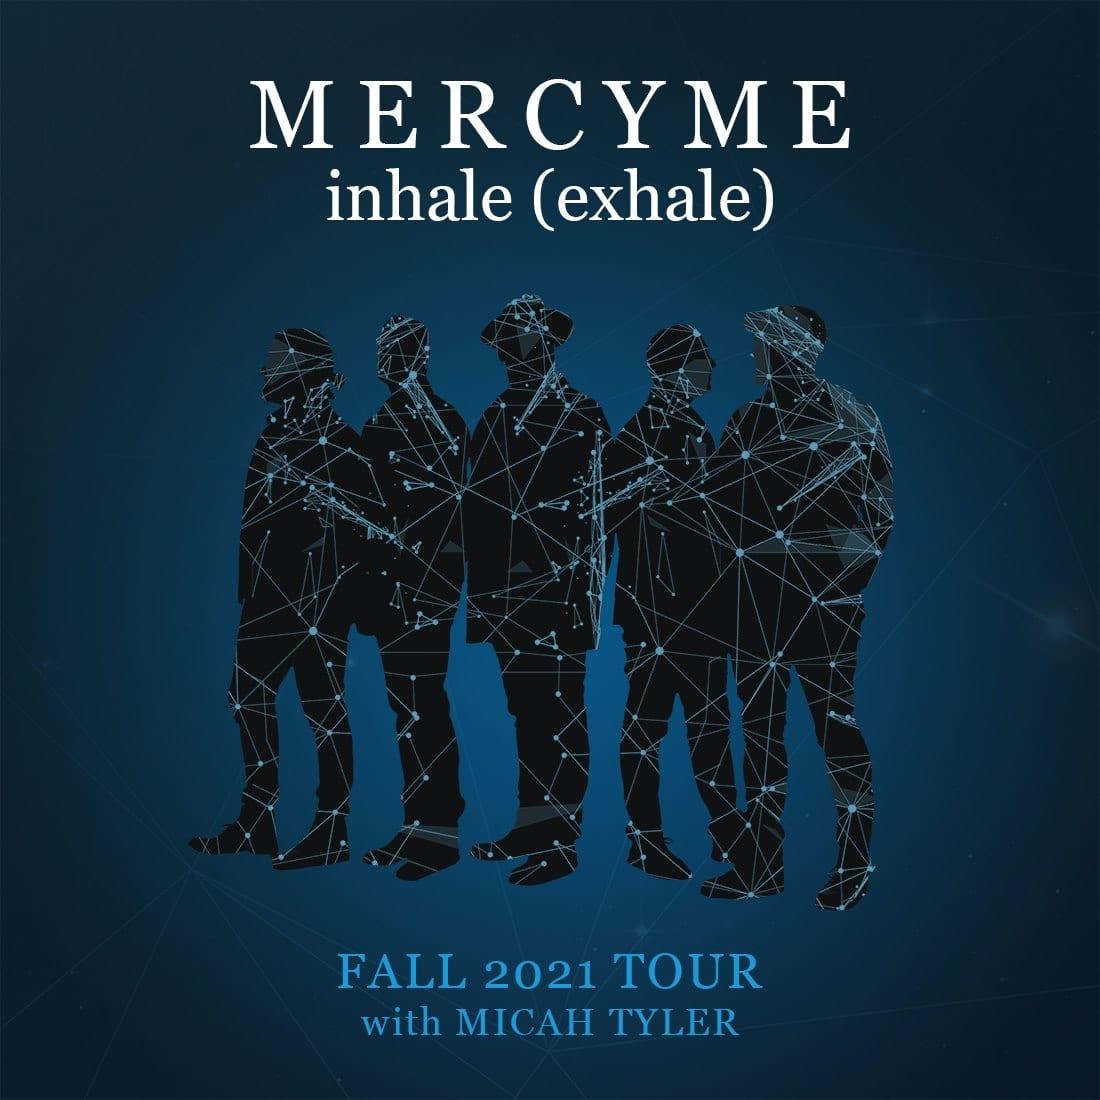 MercyMe Inhale (Exhale) Tour Calendar